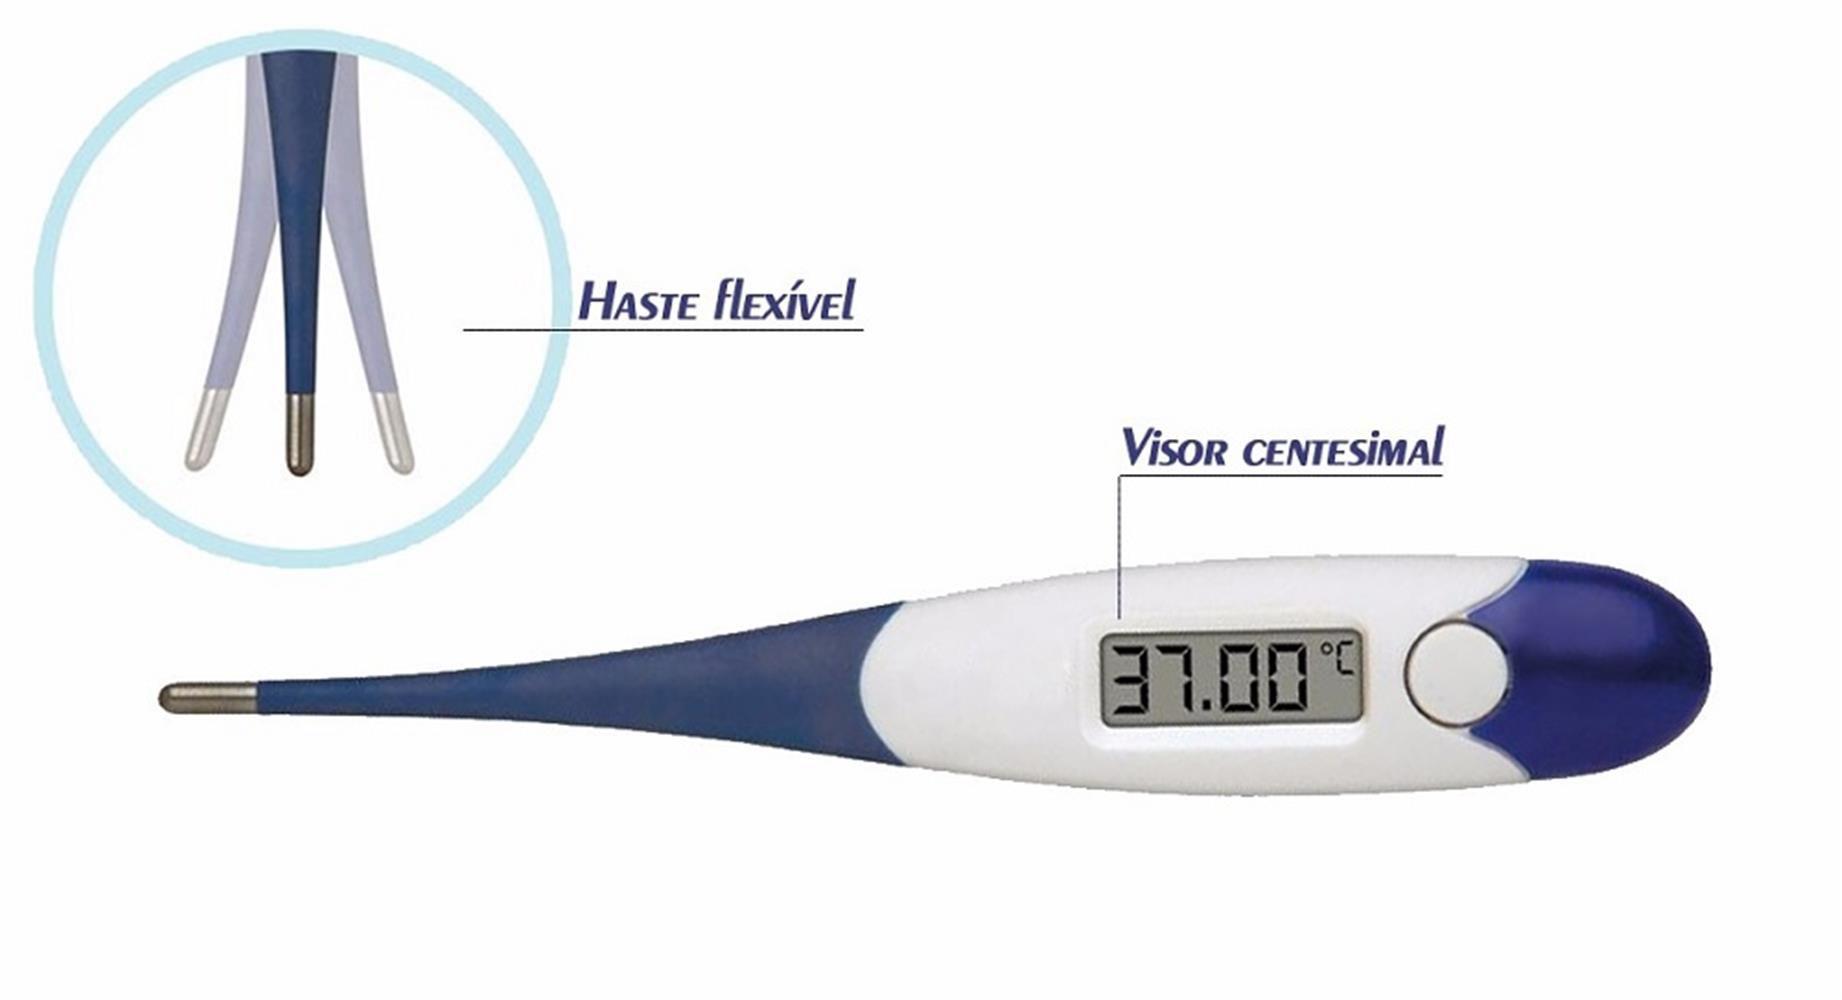 Termometro Clinico Digital Haste Flexivel Flexterm Incoterm